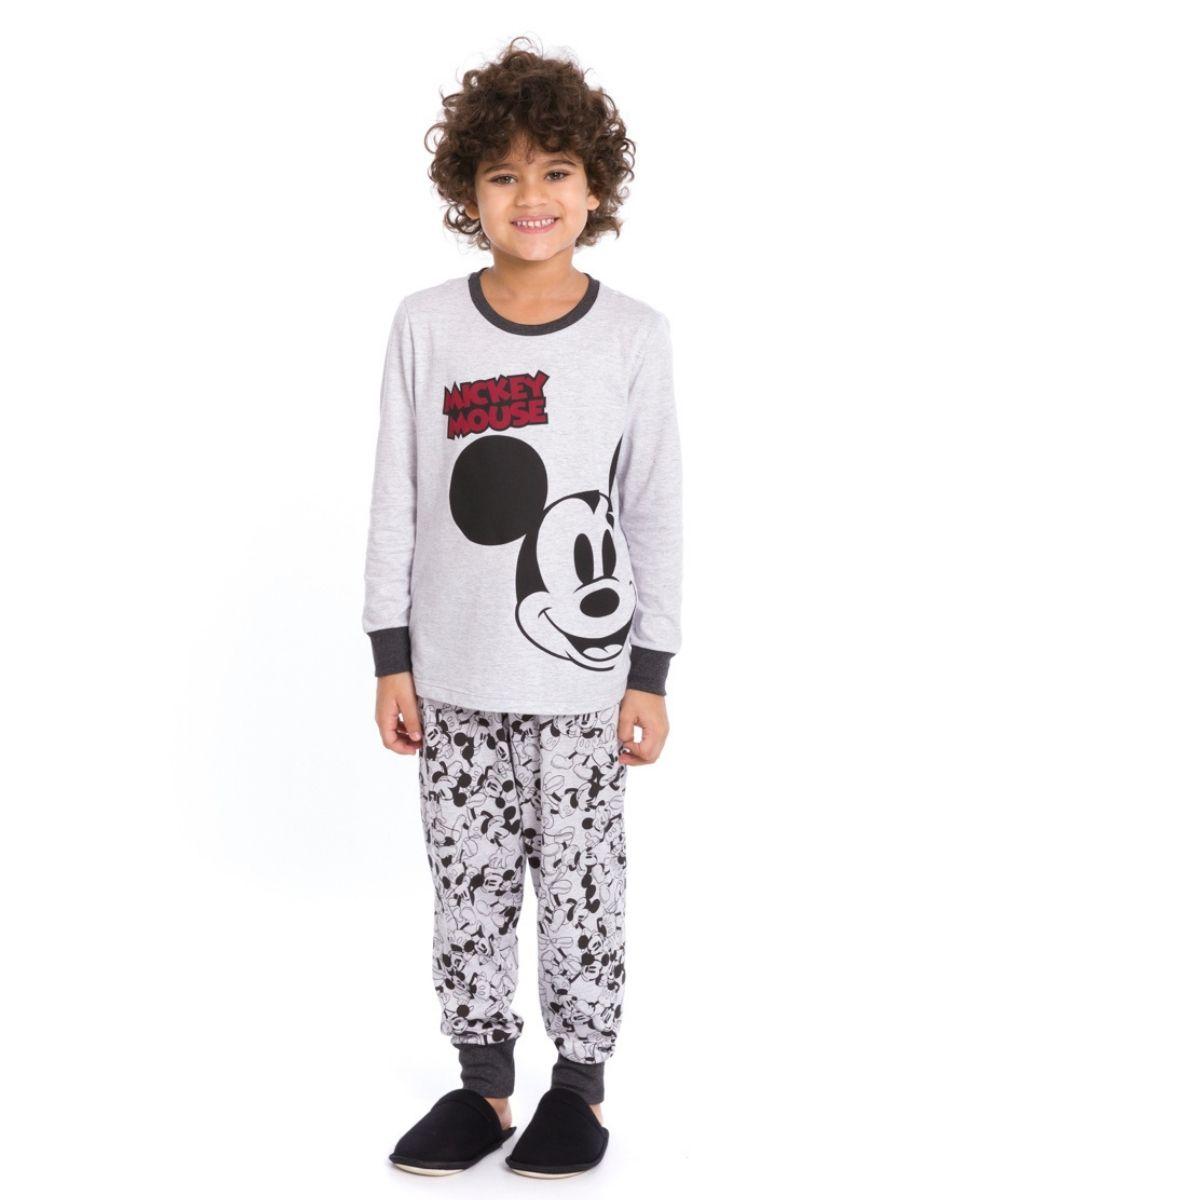 Pijama infantil menino Mickey algodão frio mescla